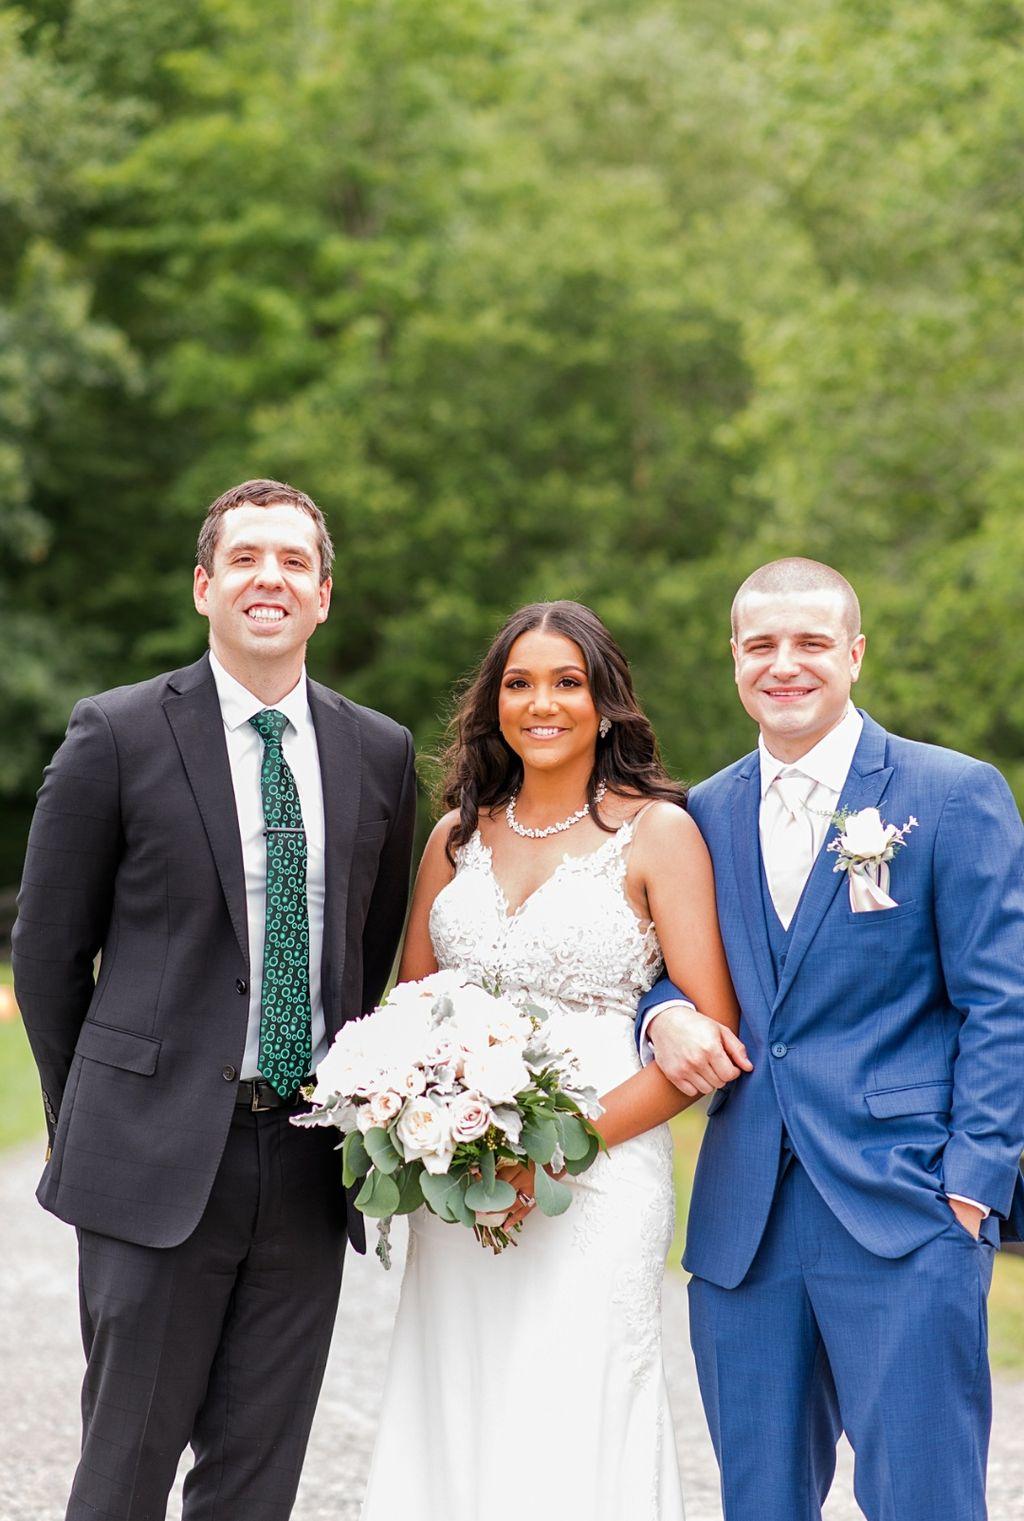 Wedding Officiant - Fredericksburg 2020